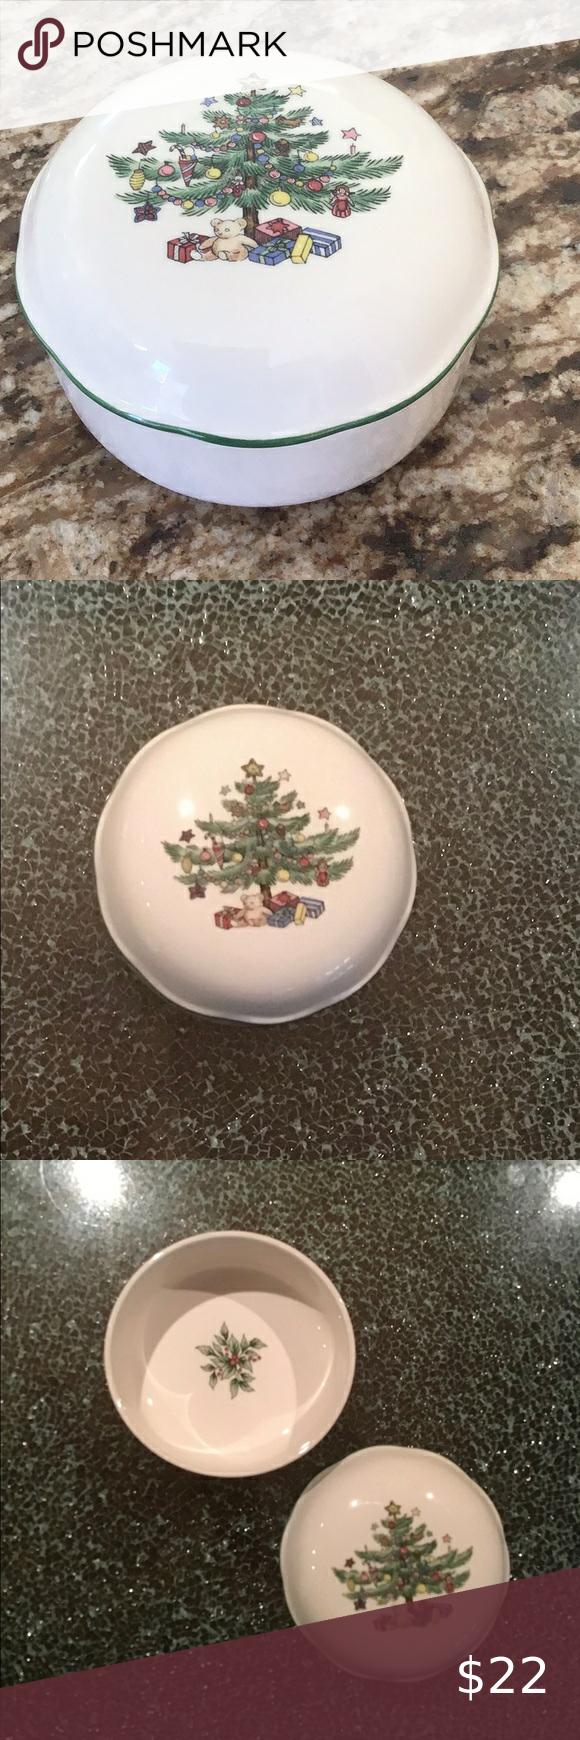 Vintage Nikko Christmas trinket or candy dish Vint